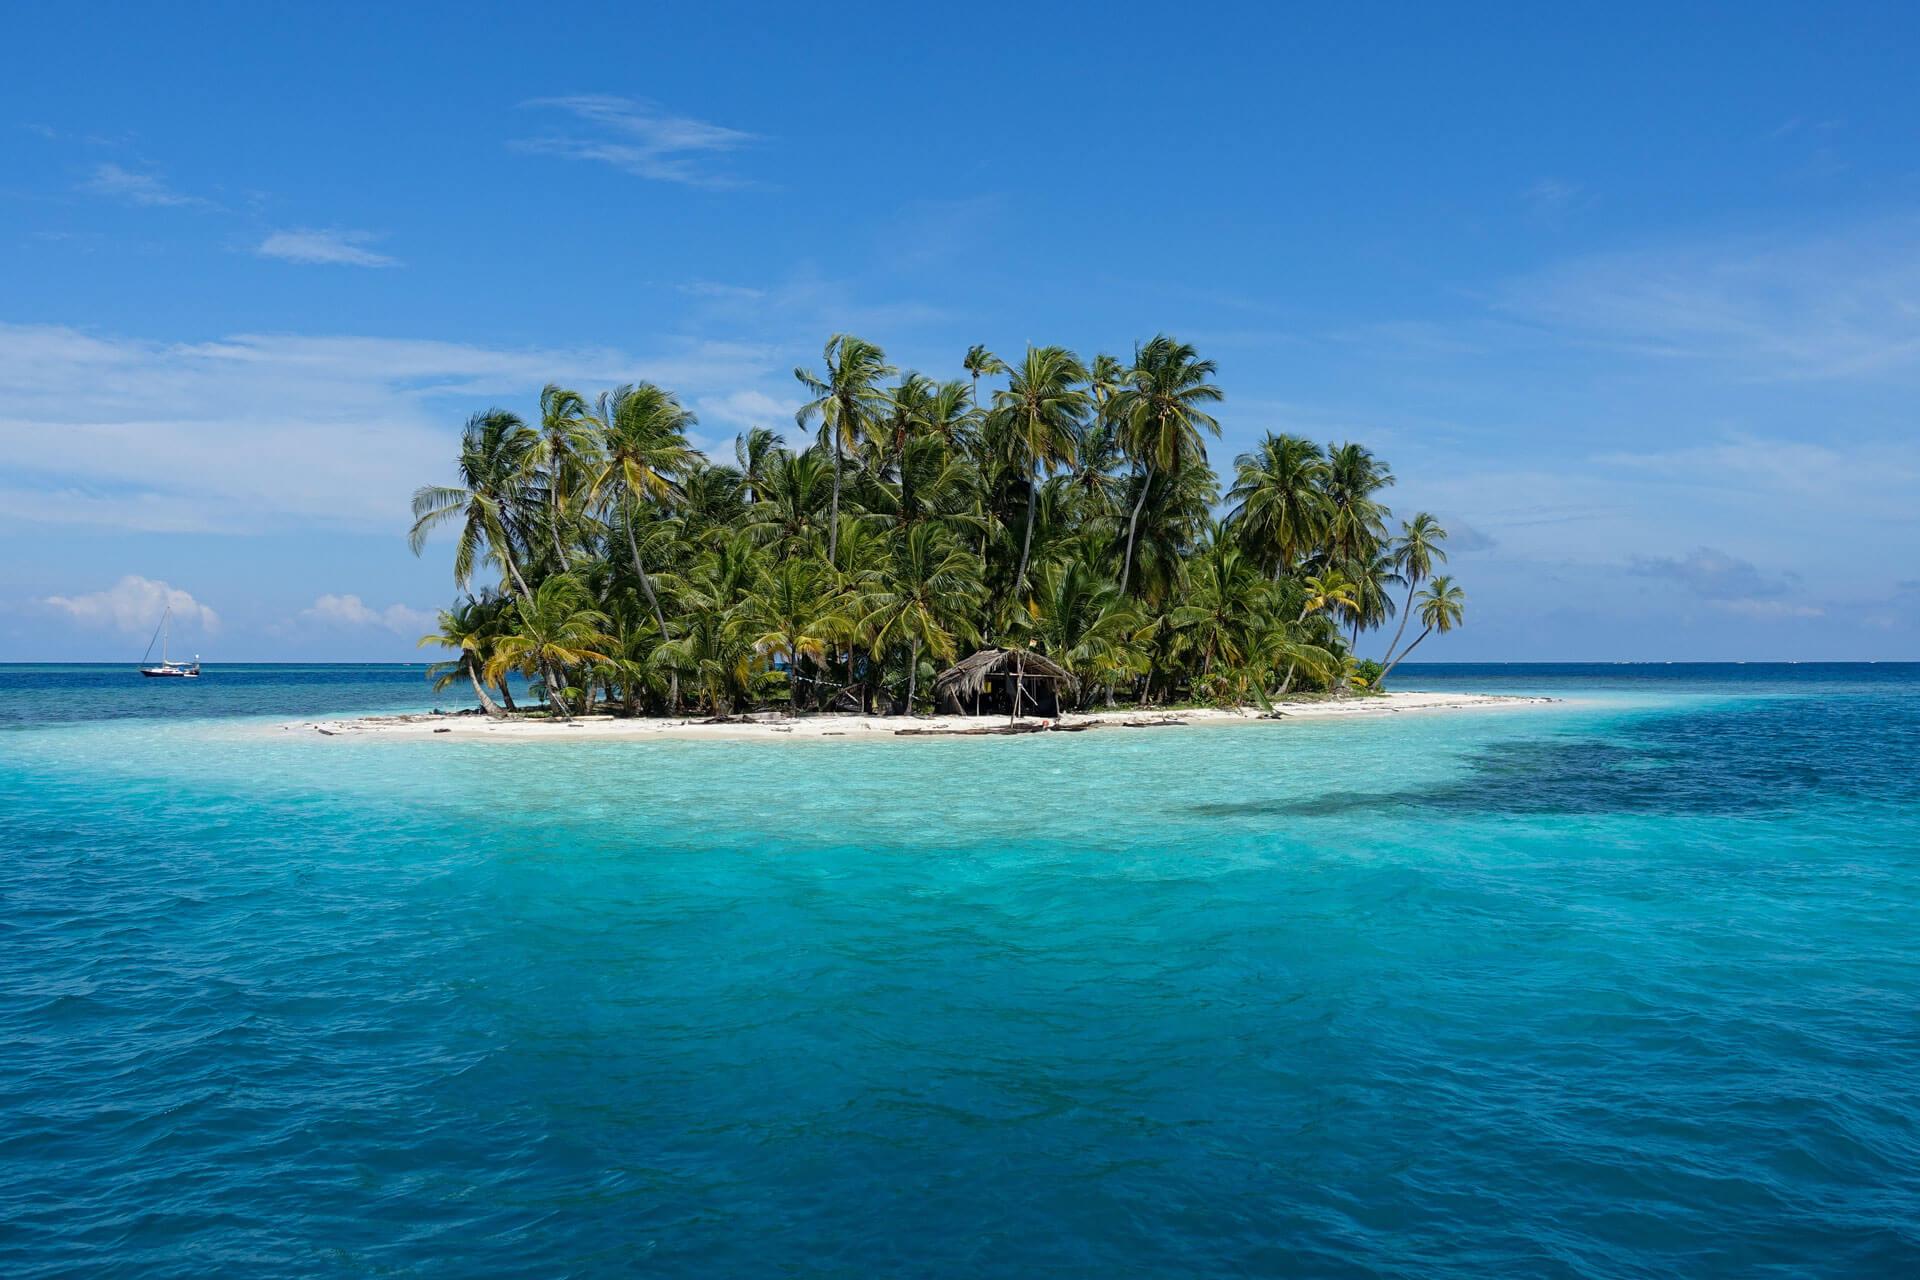 11One of the many uninhabited islands in the San Blas Islands, Panama